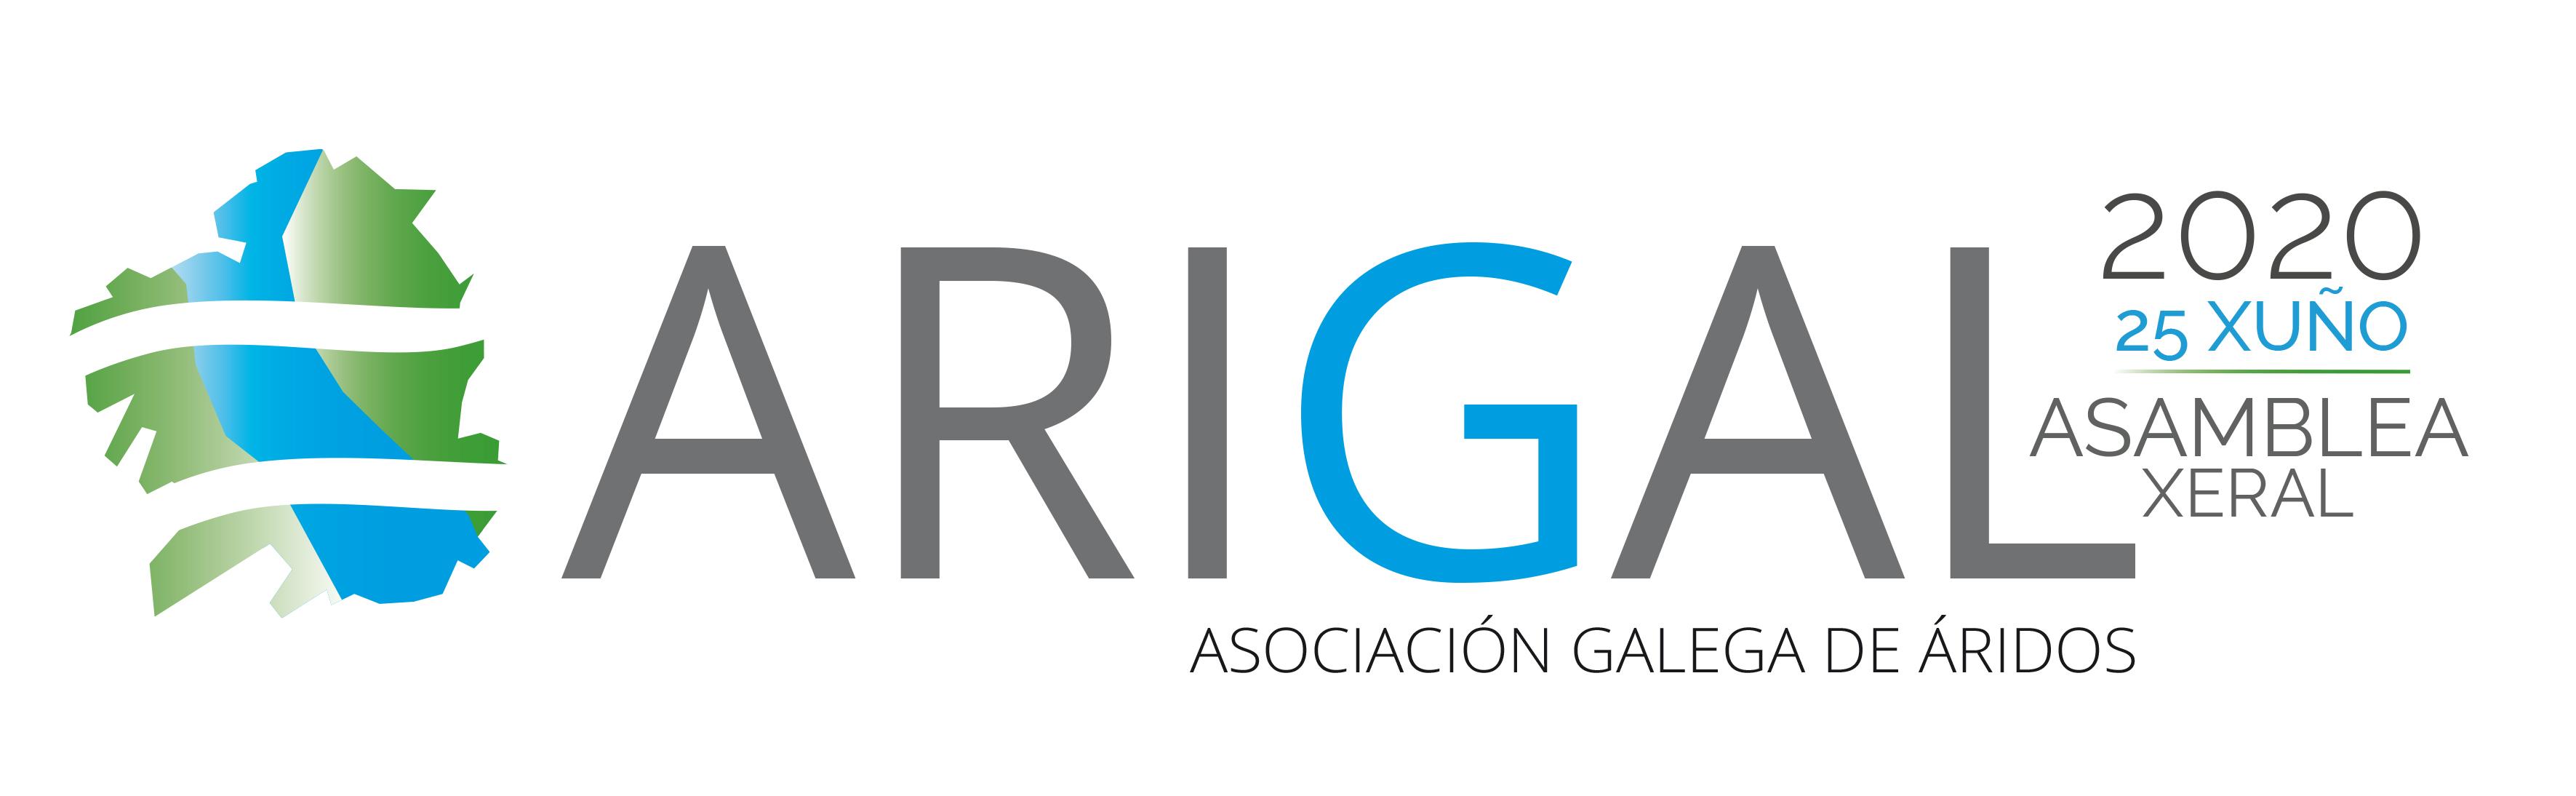 ARIGAL_LOGO_Asamblea-Xeral-2020